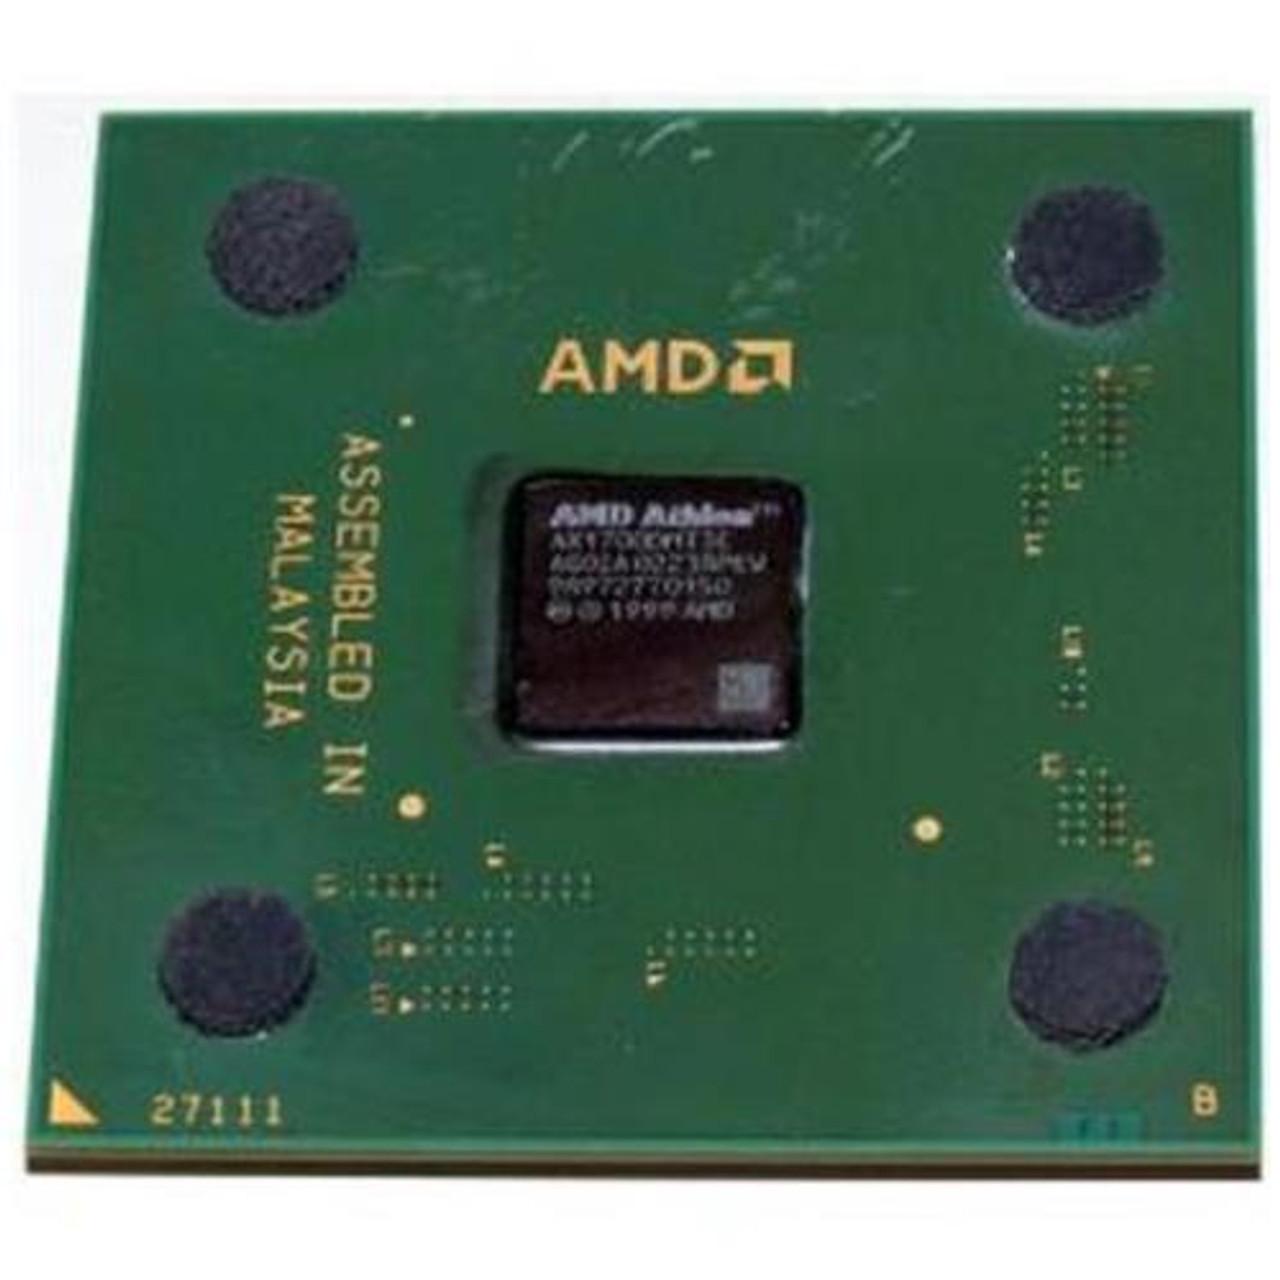 AX1700DMT3C AMD Athlon XP 1700 256KB 266 MHz AMD